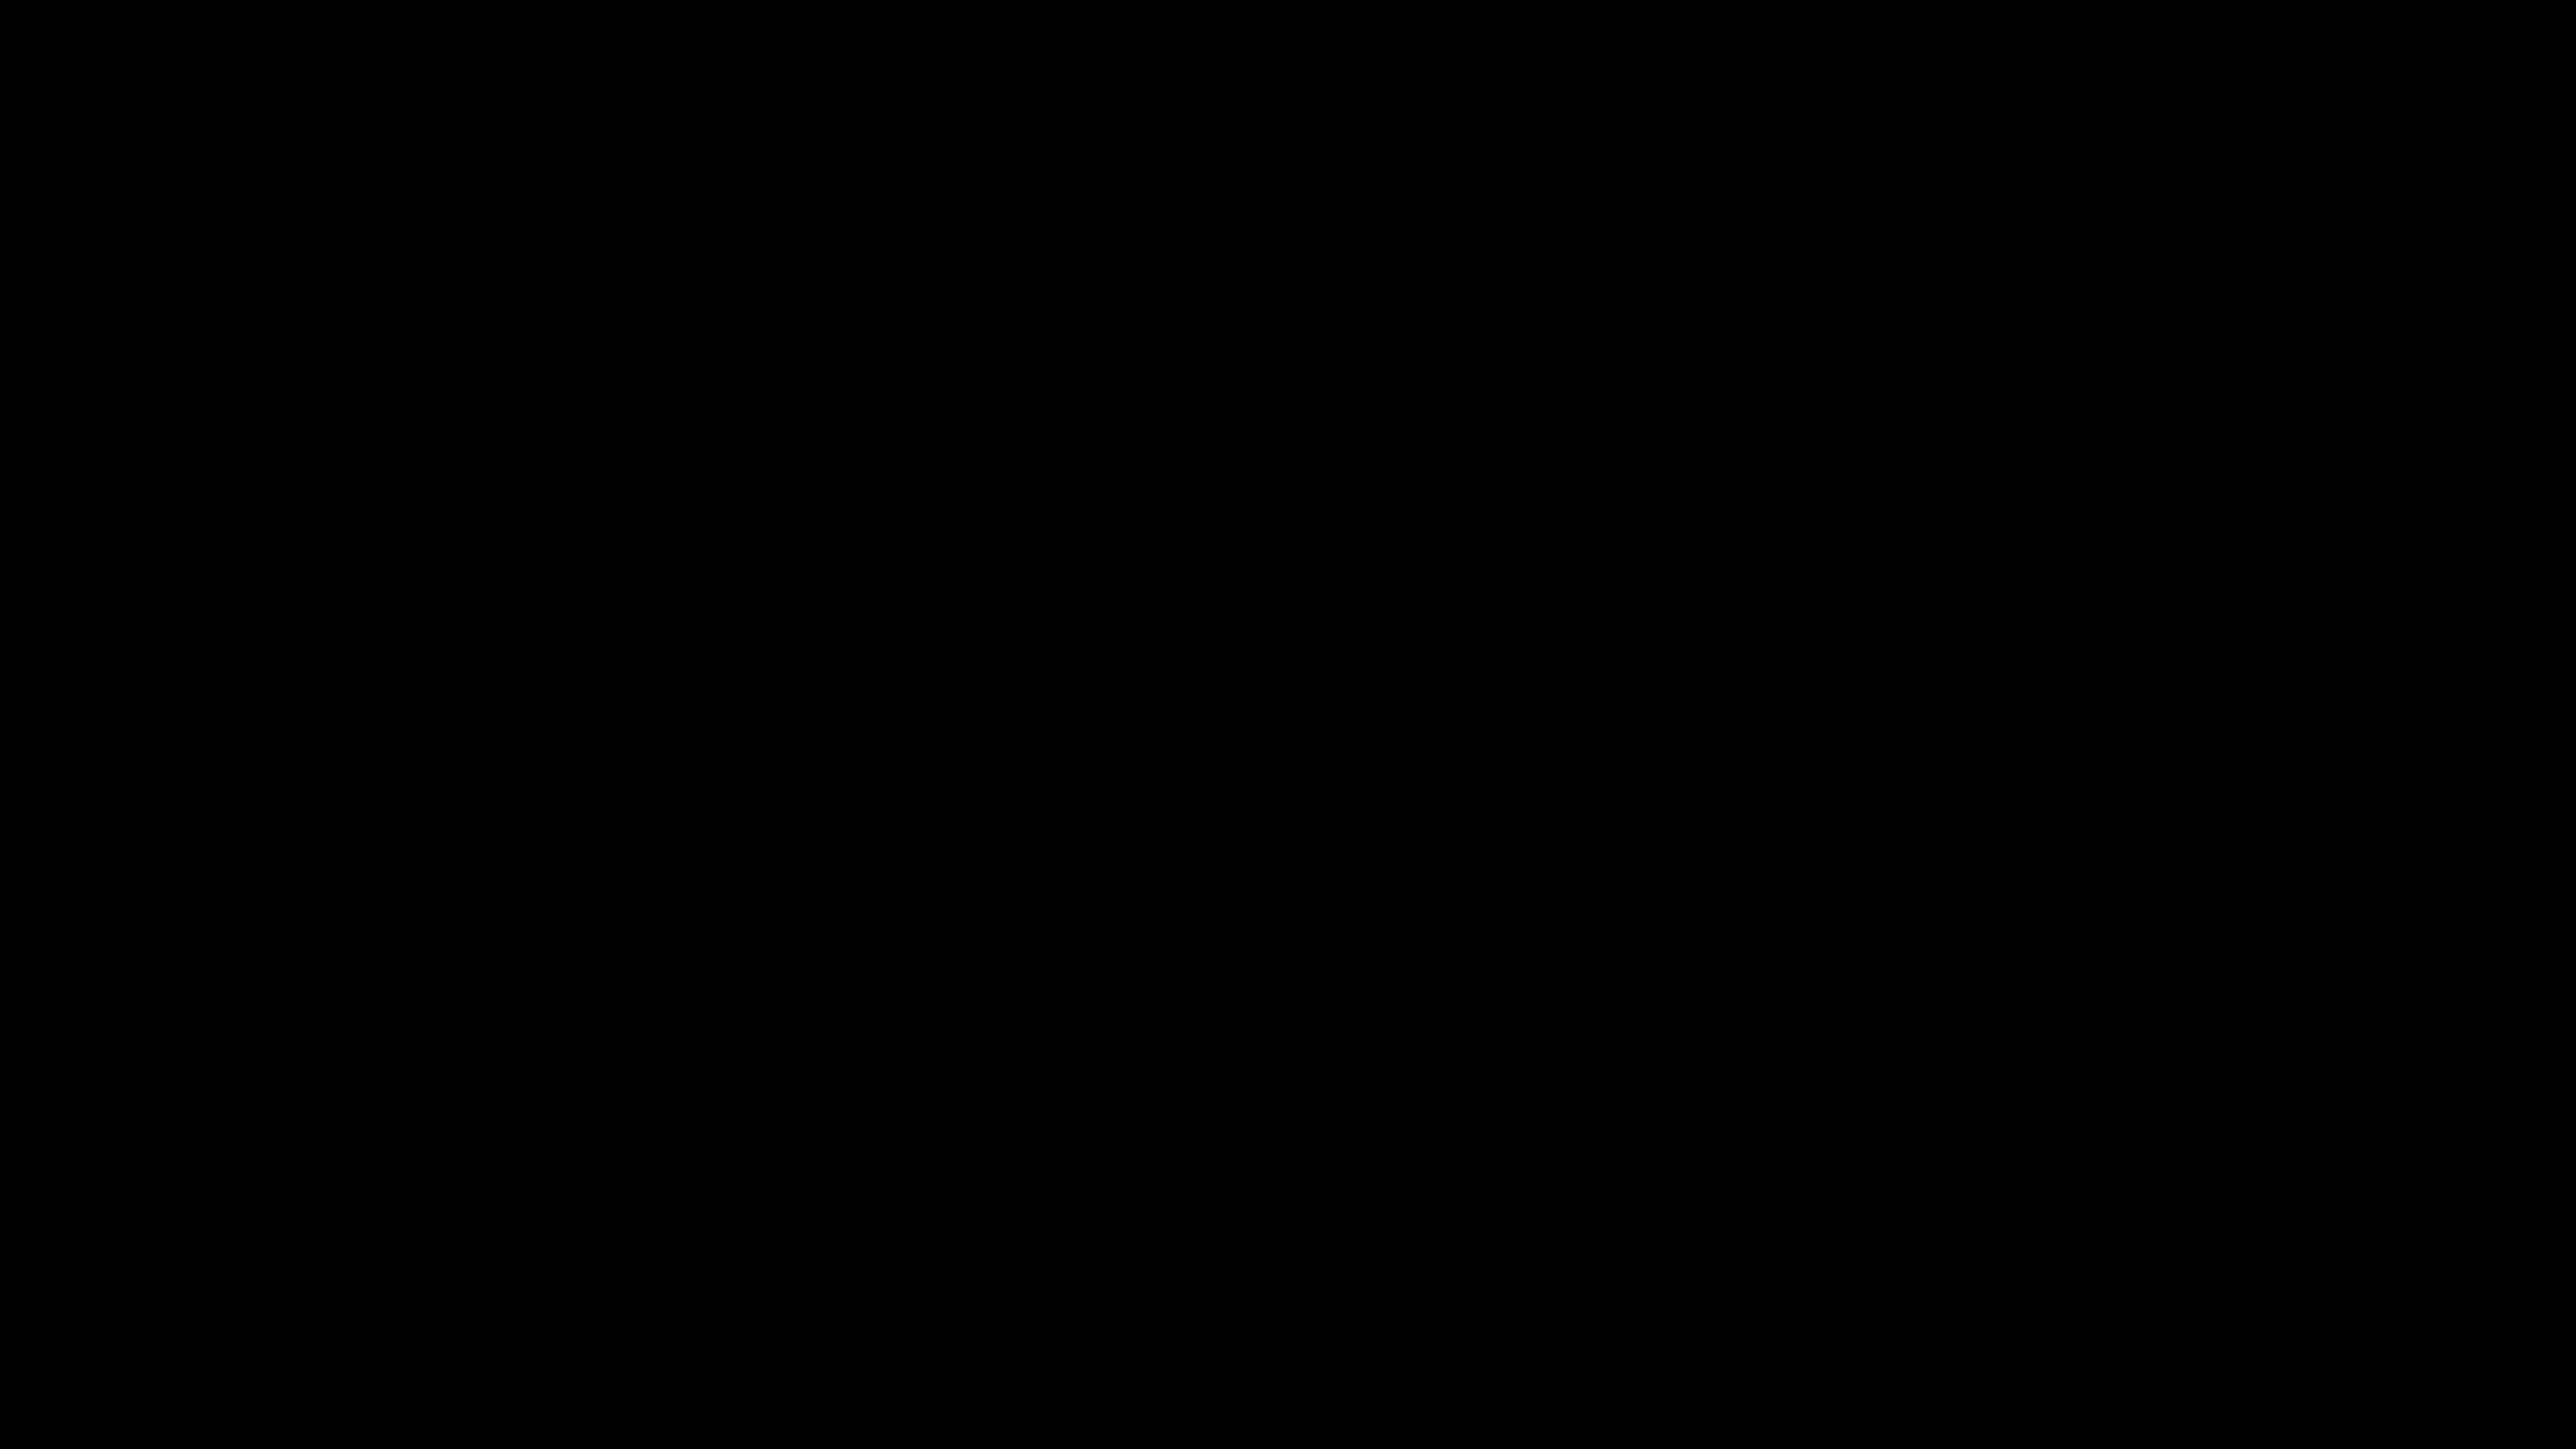 default_2016-04-23_84789.jpg